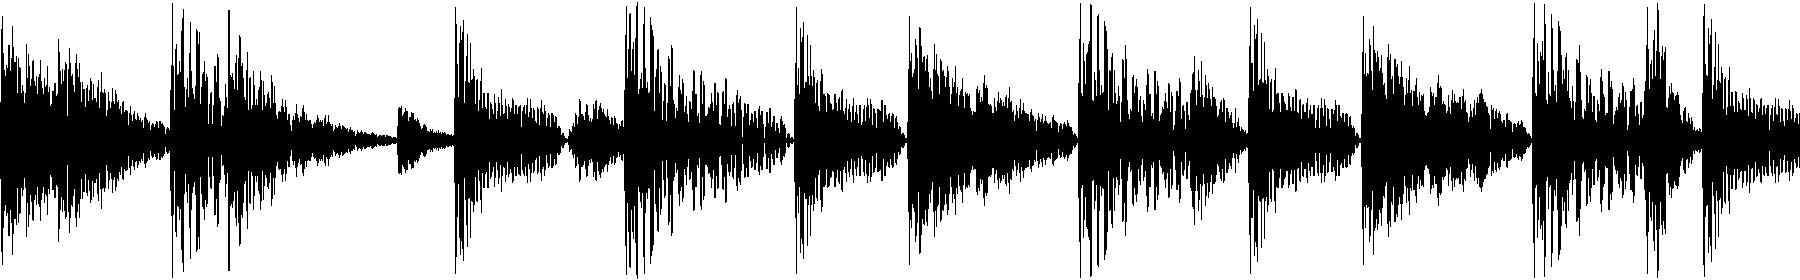 bluezone bc0210 percussion loop 008 110